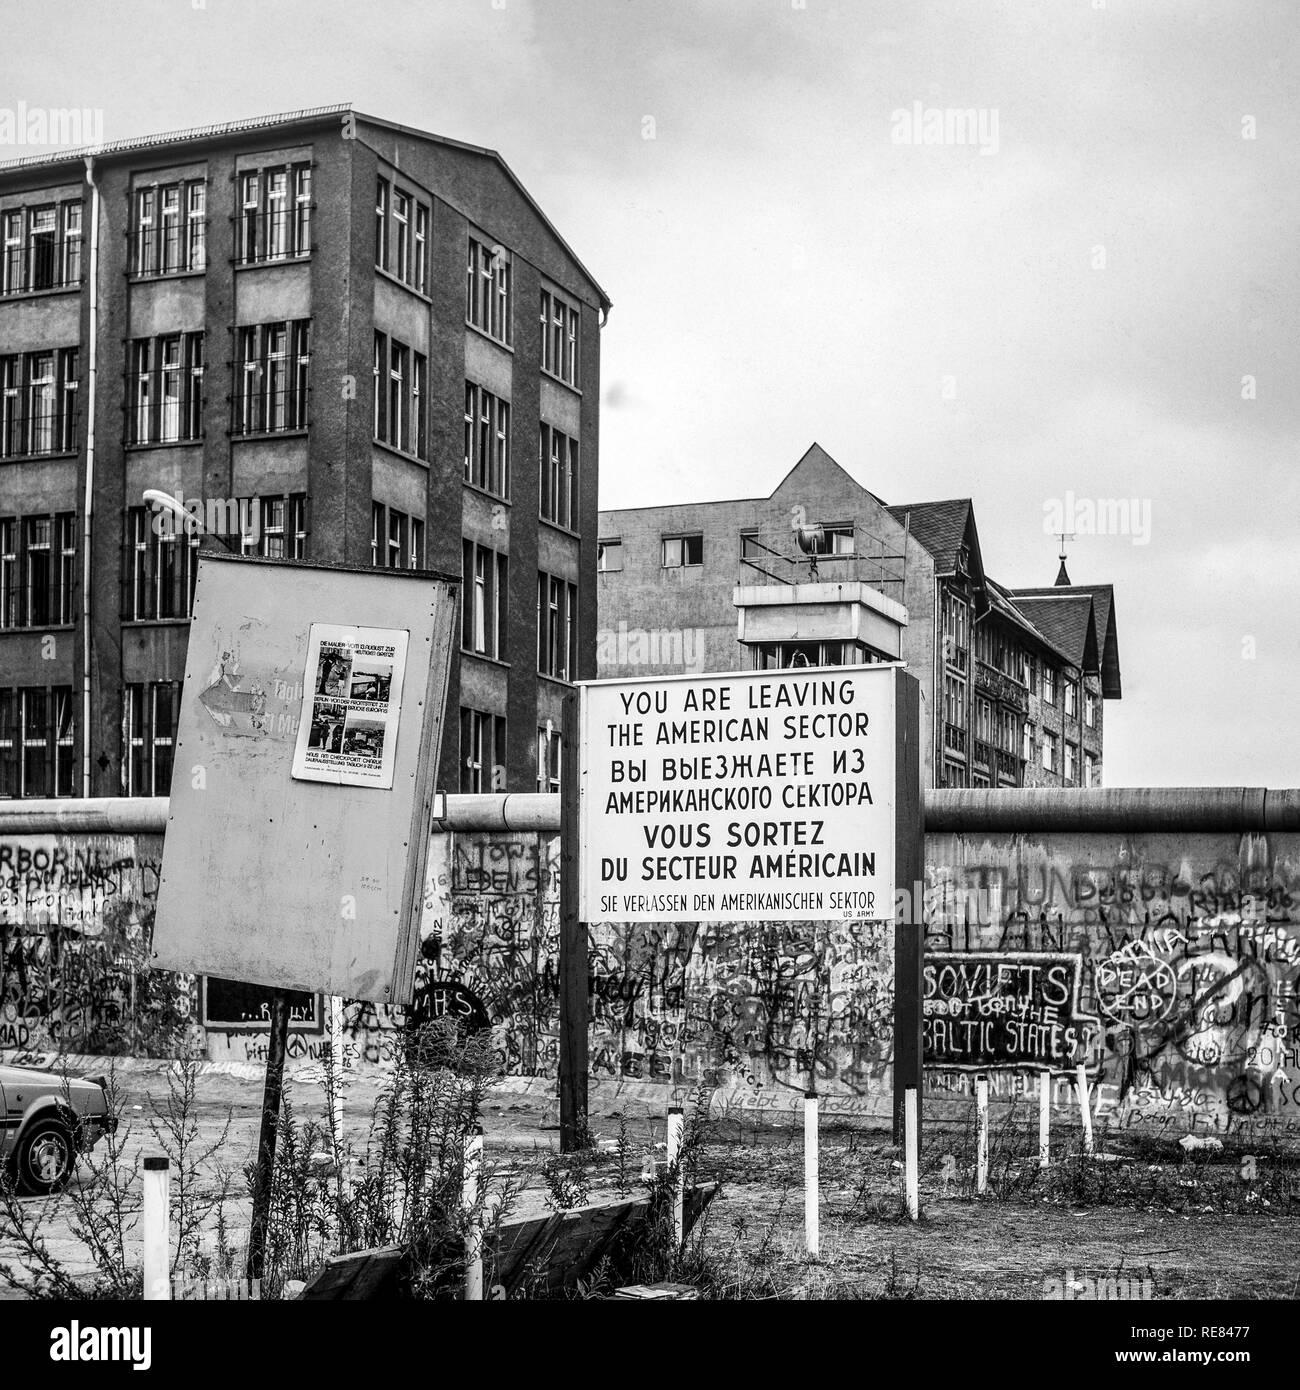 August 1986, leaving American sector warning sign, Berlin Wall graffitis, East Berlin watchtower, Zimmerstrasse street, West Berlin, Germany, Europe, - Stock Image